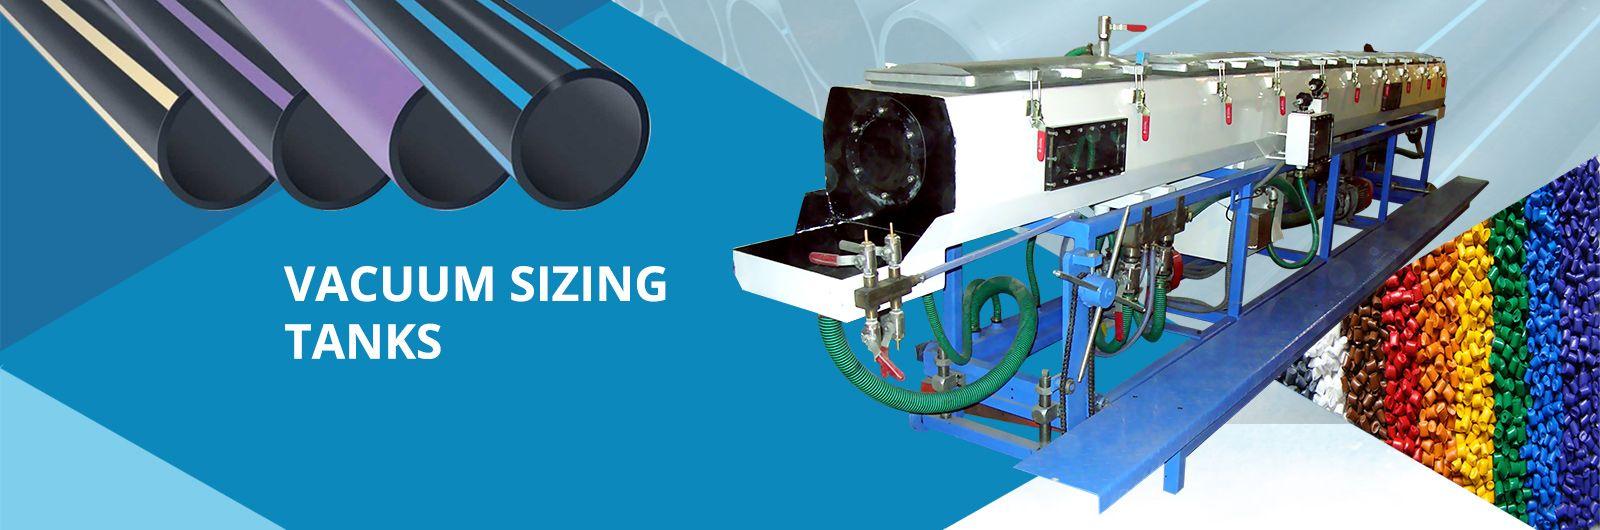 vacuum sizing tanks manufacturer